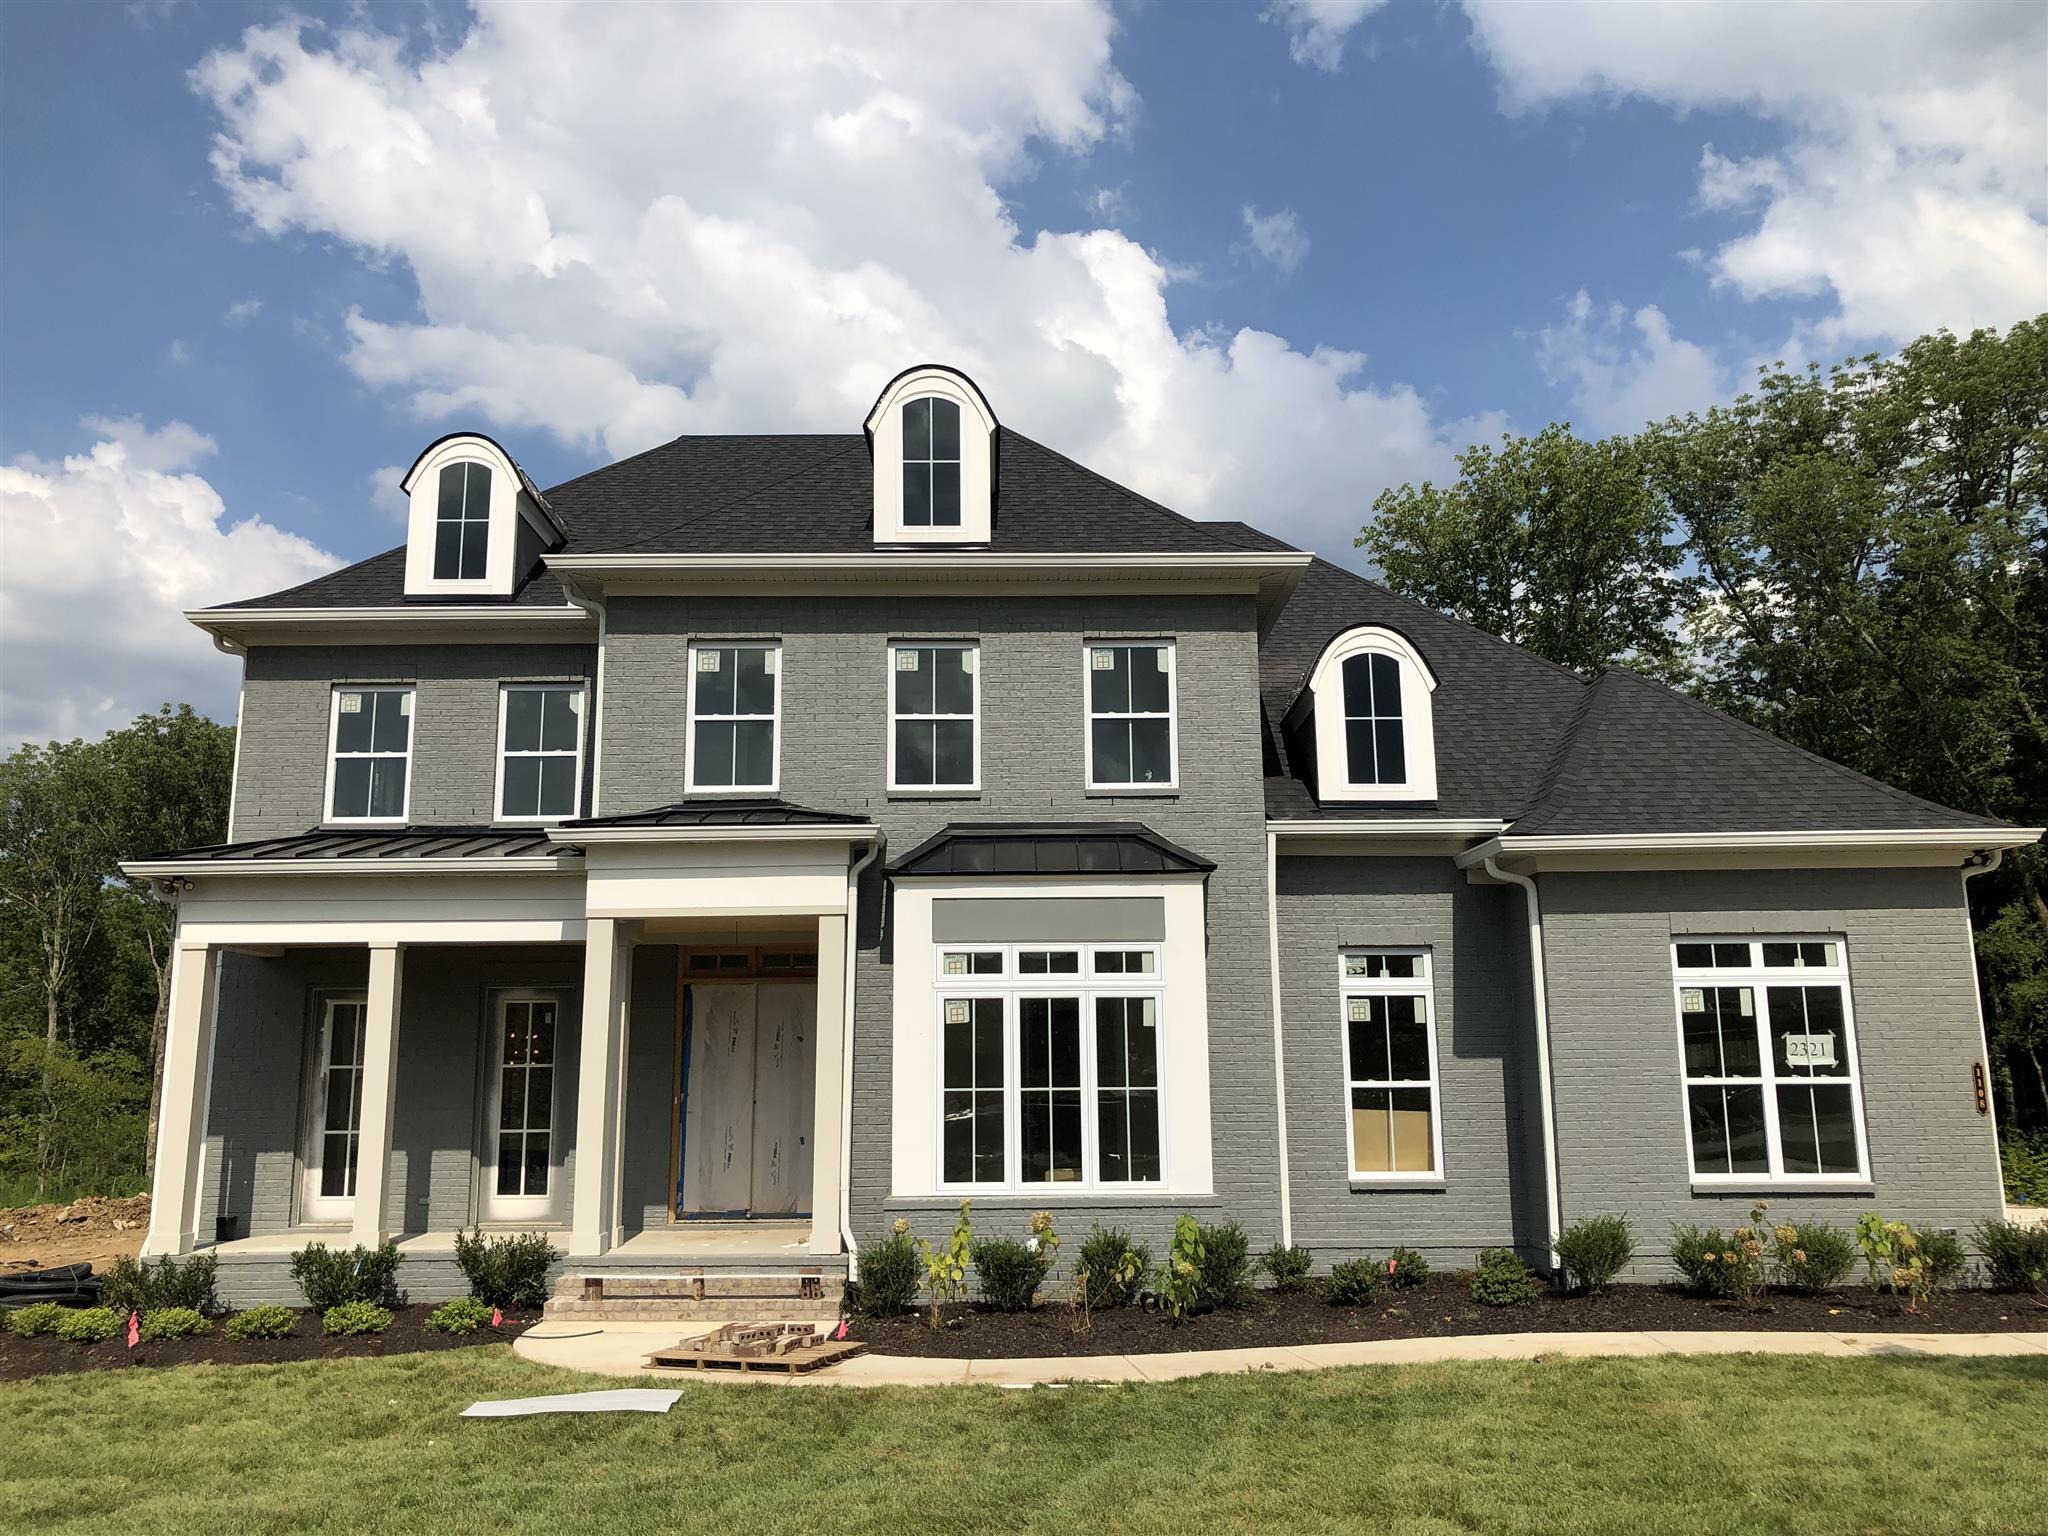 1108 LUSITANO COURT LOT 2321, Nolensville, TN 37135 - Nolensville, TN real estate listing